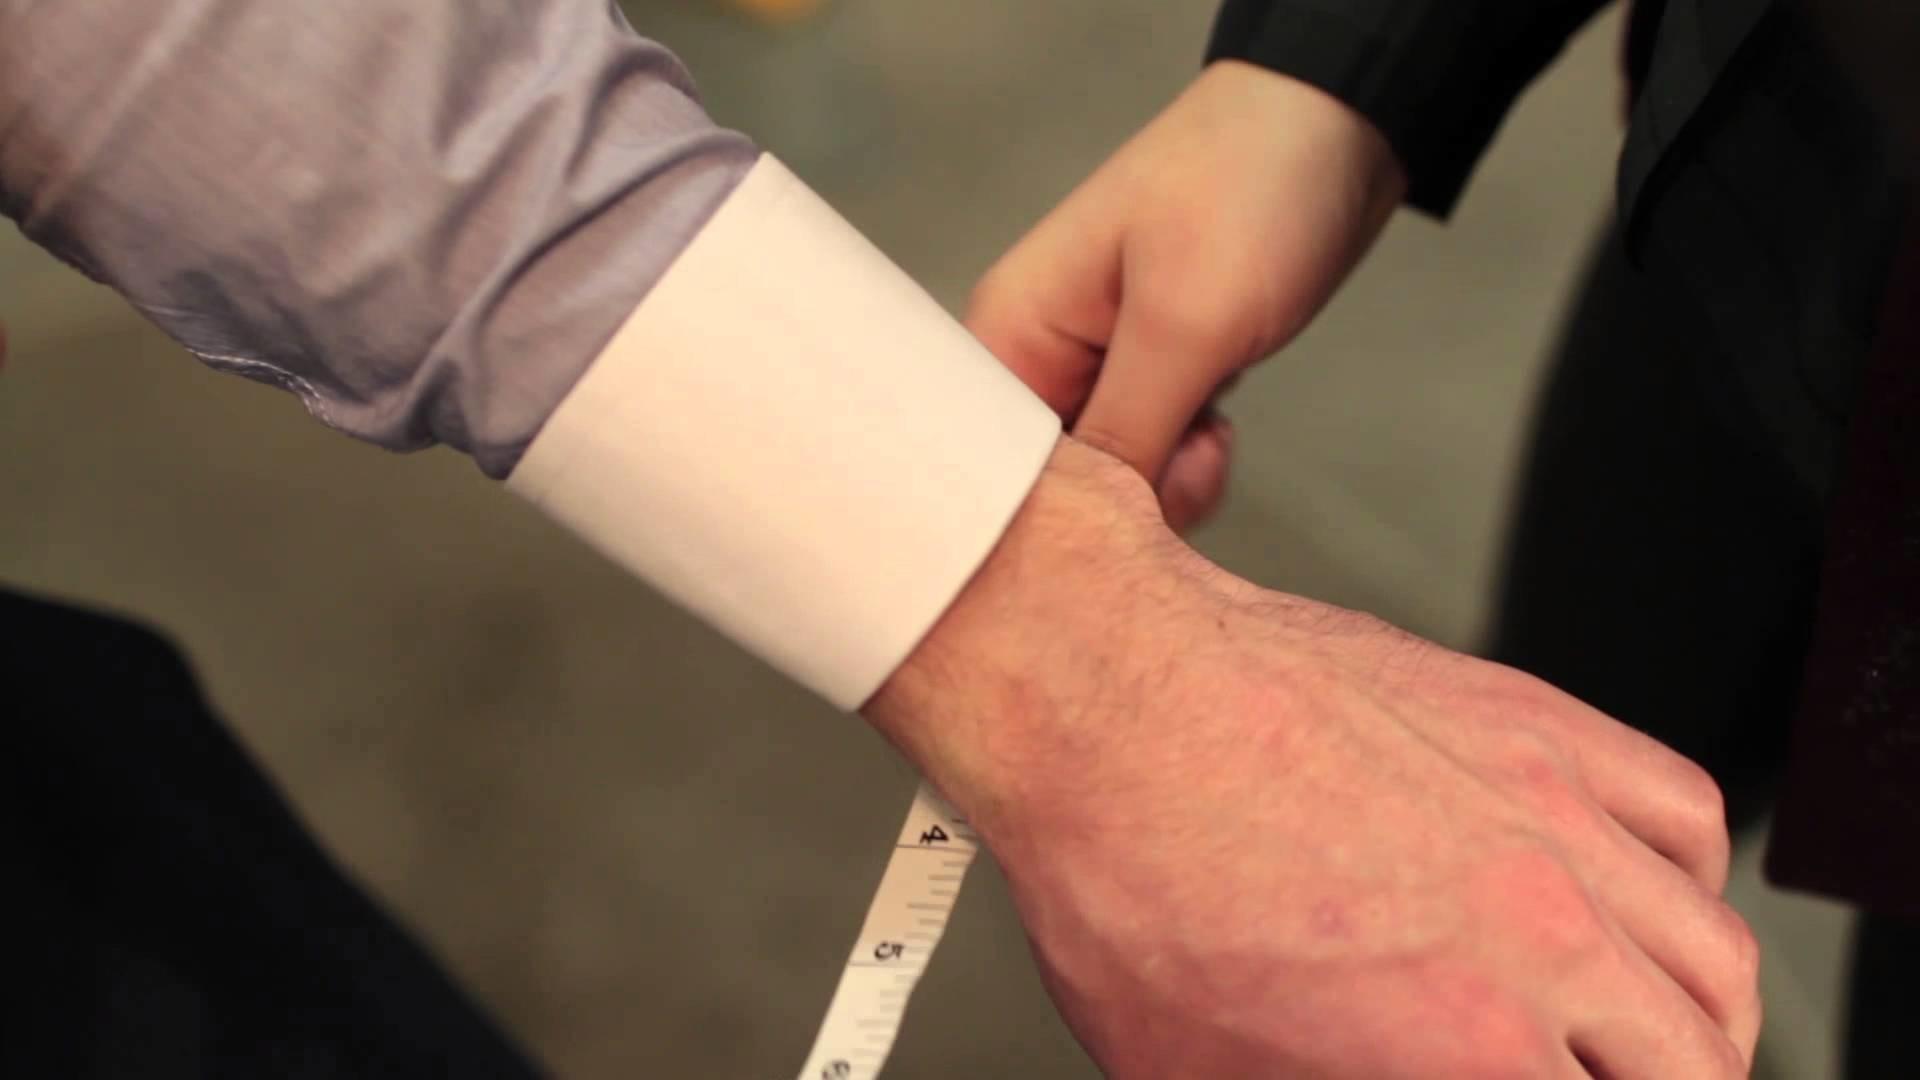 Eph Apparel - Suit Measurement Tutorial - Wrist